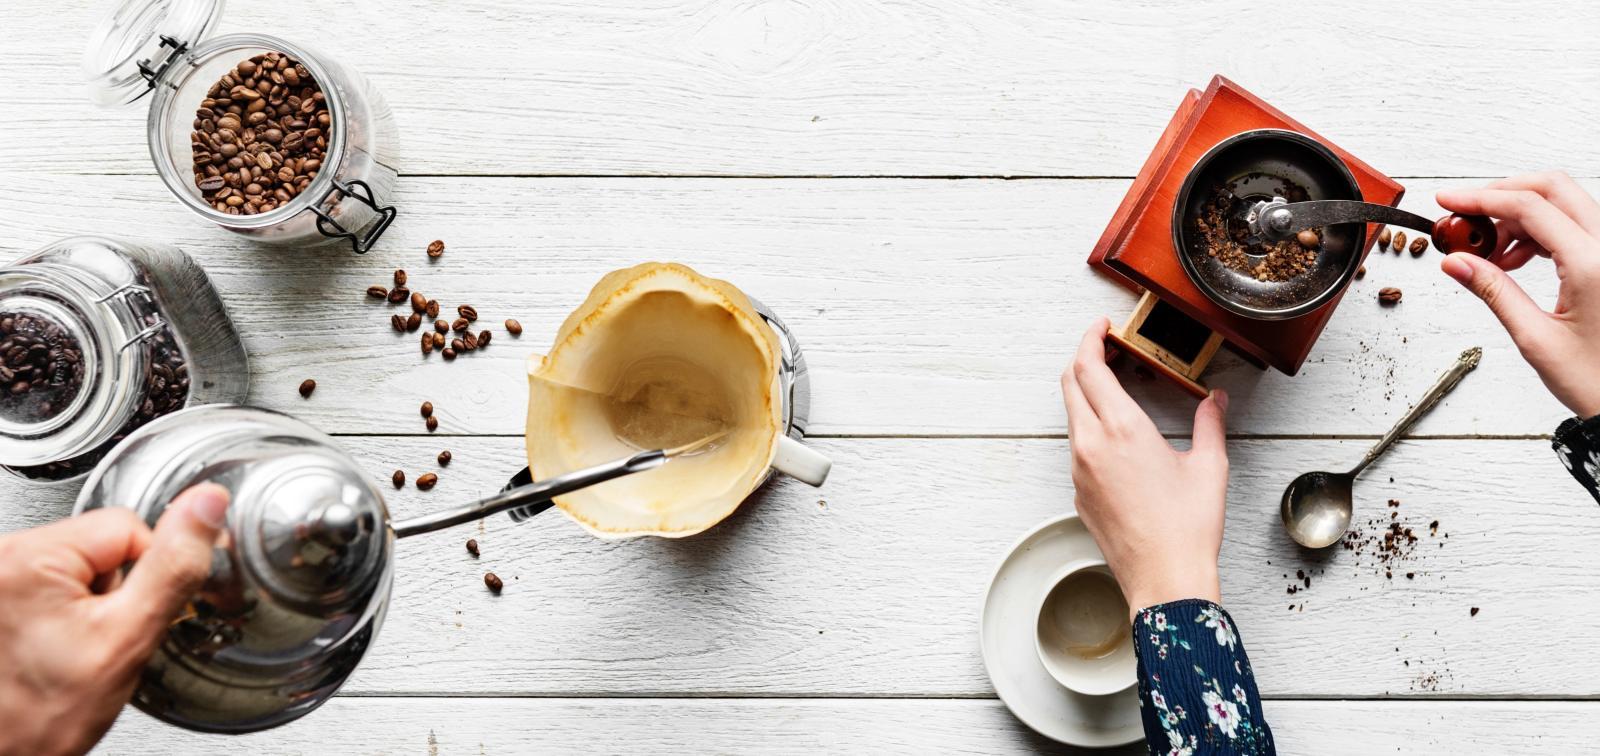 coffee grinding